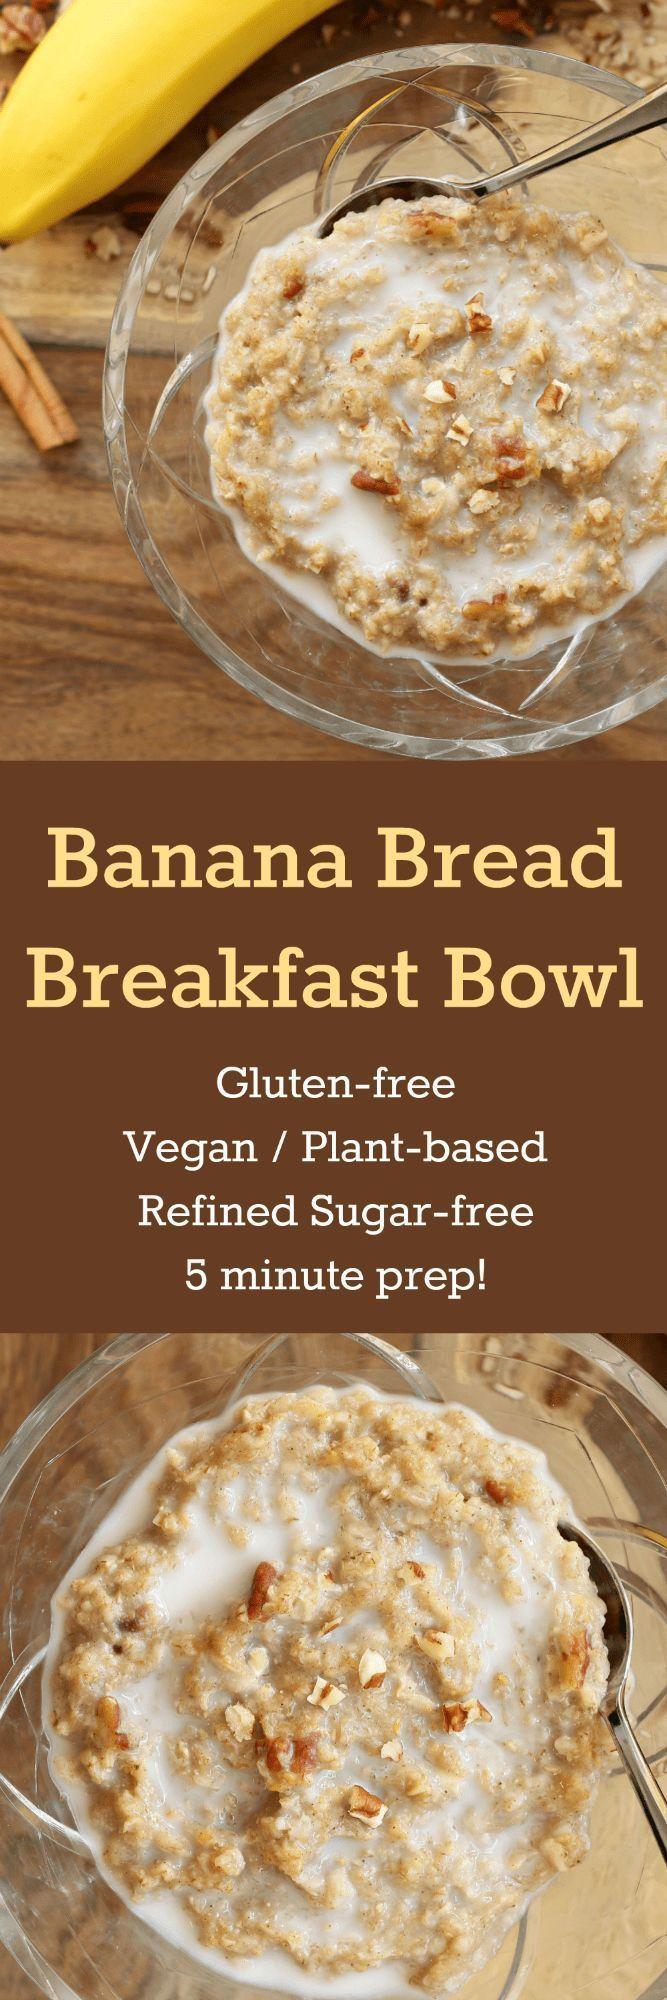 Banana Bread Breakfast Bowl (Gluten-free, Plant-based, Refined Sugar-free)